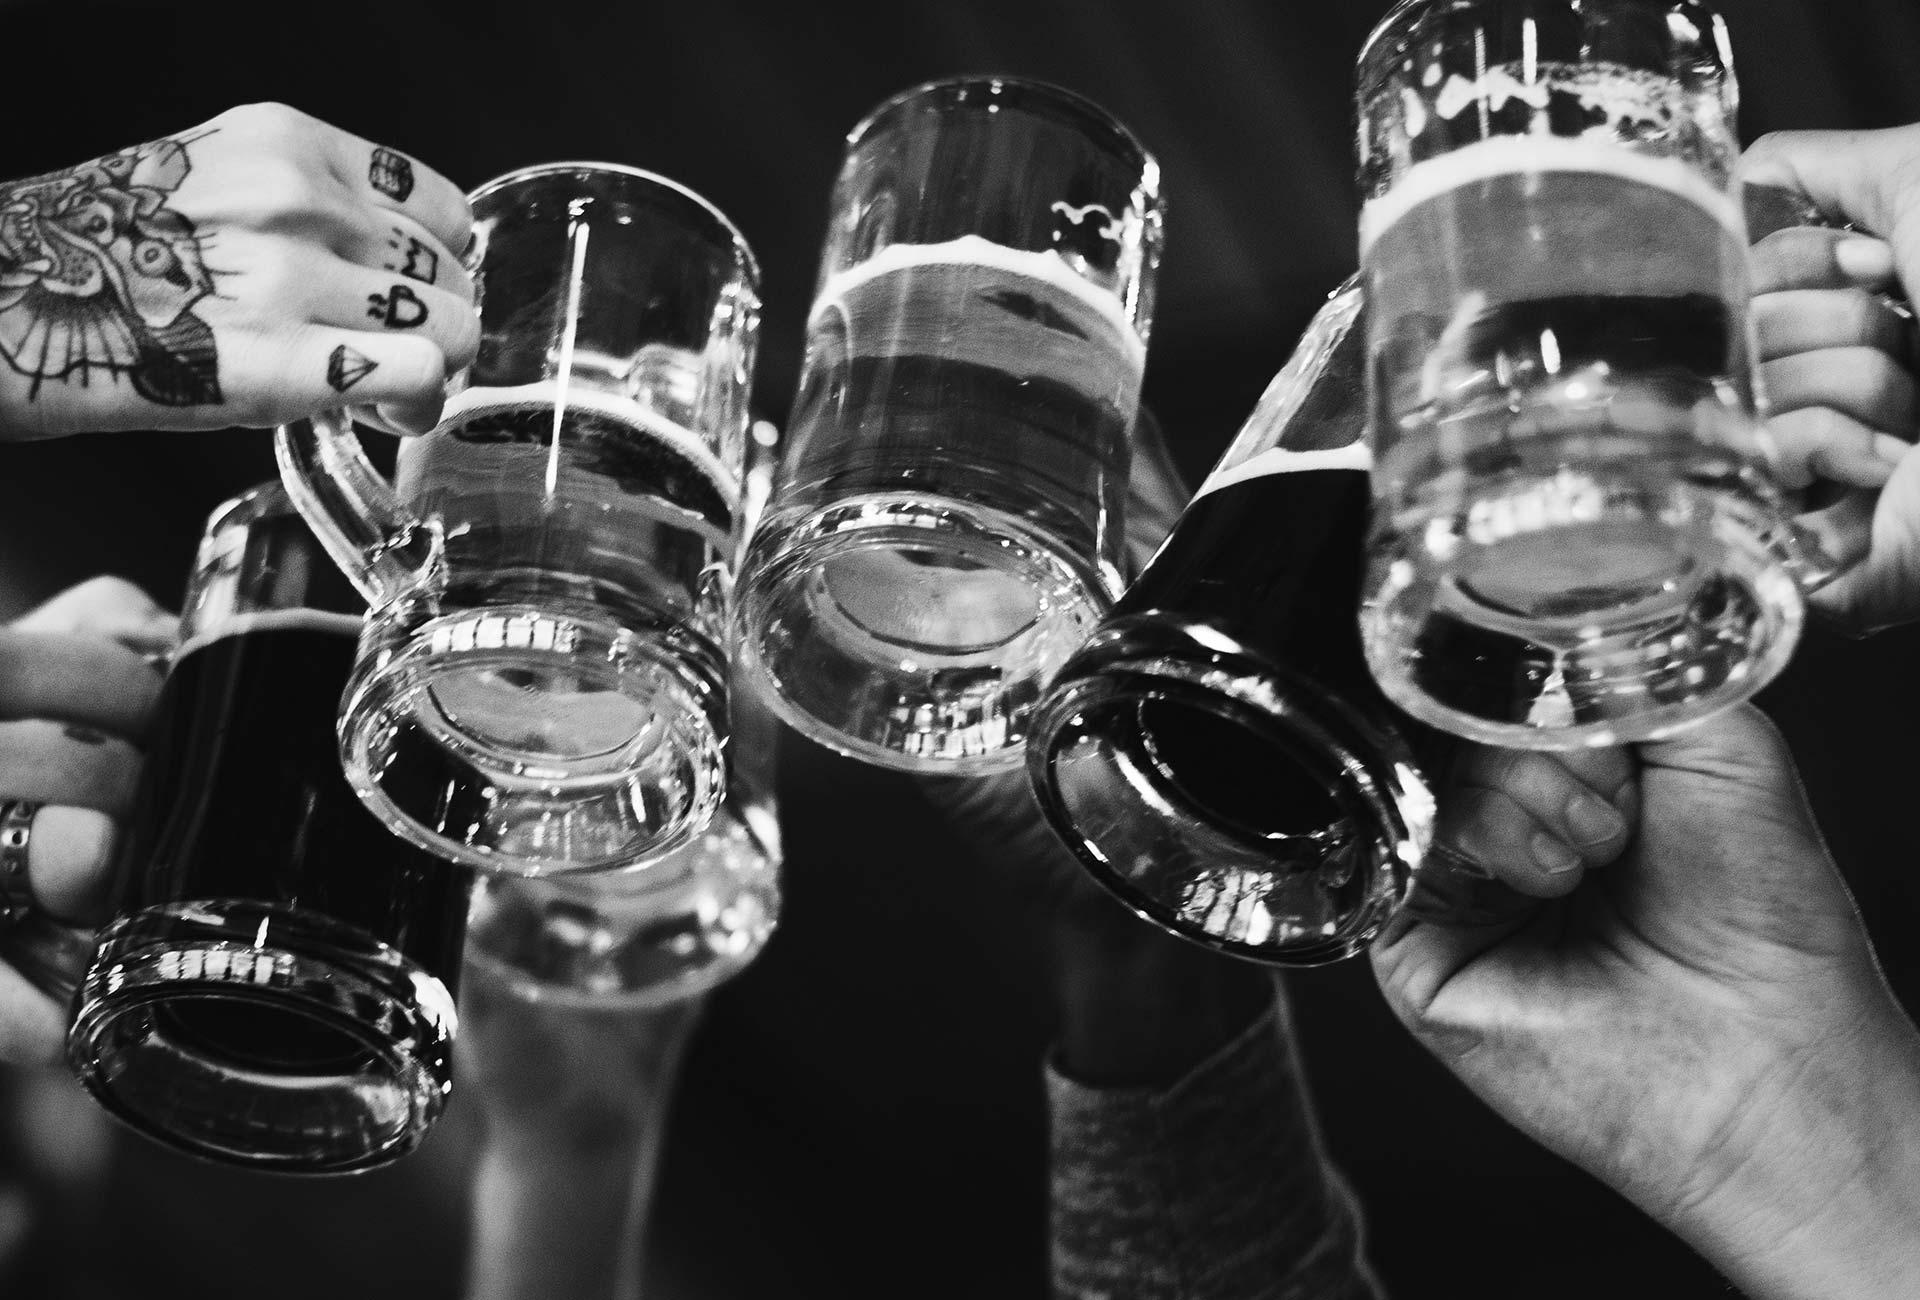 Beer mugs clinking together